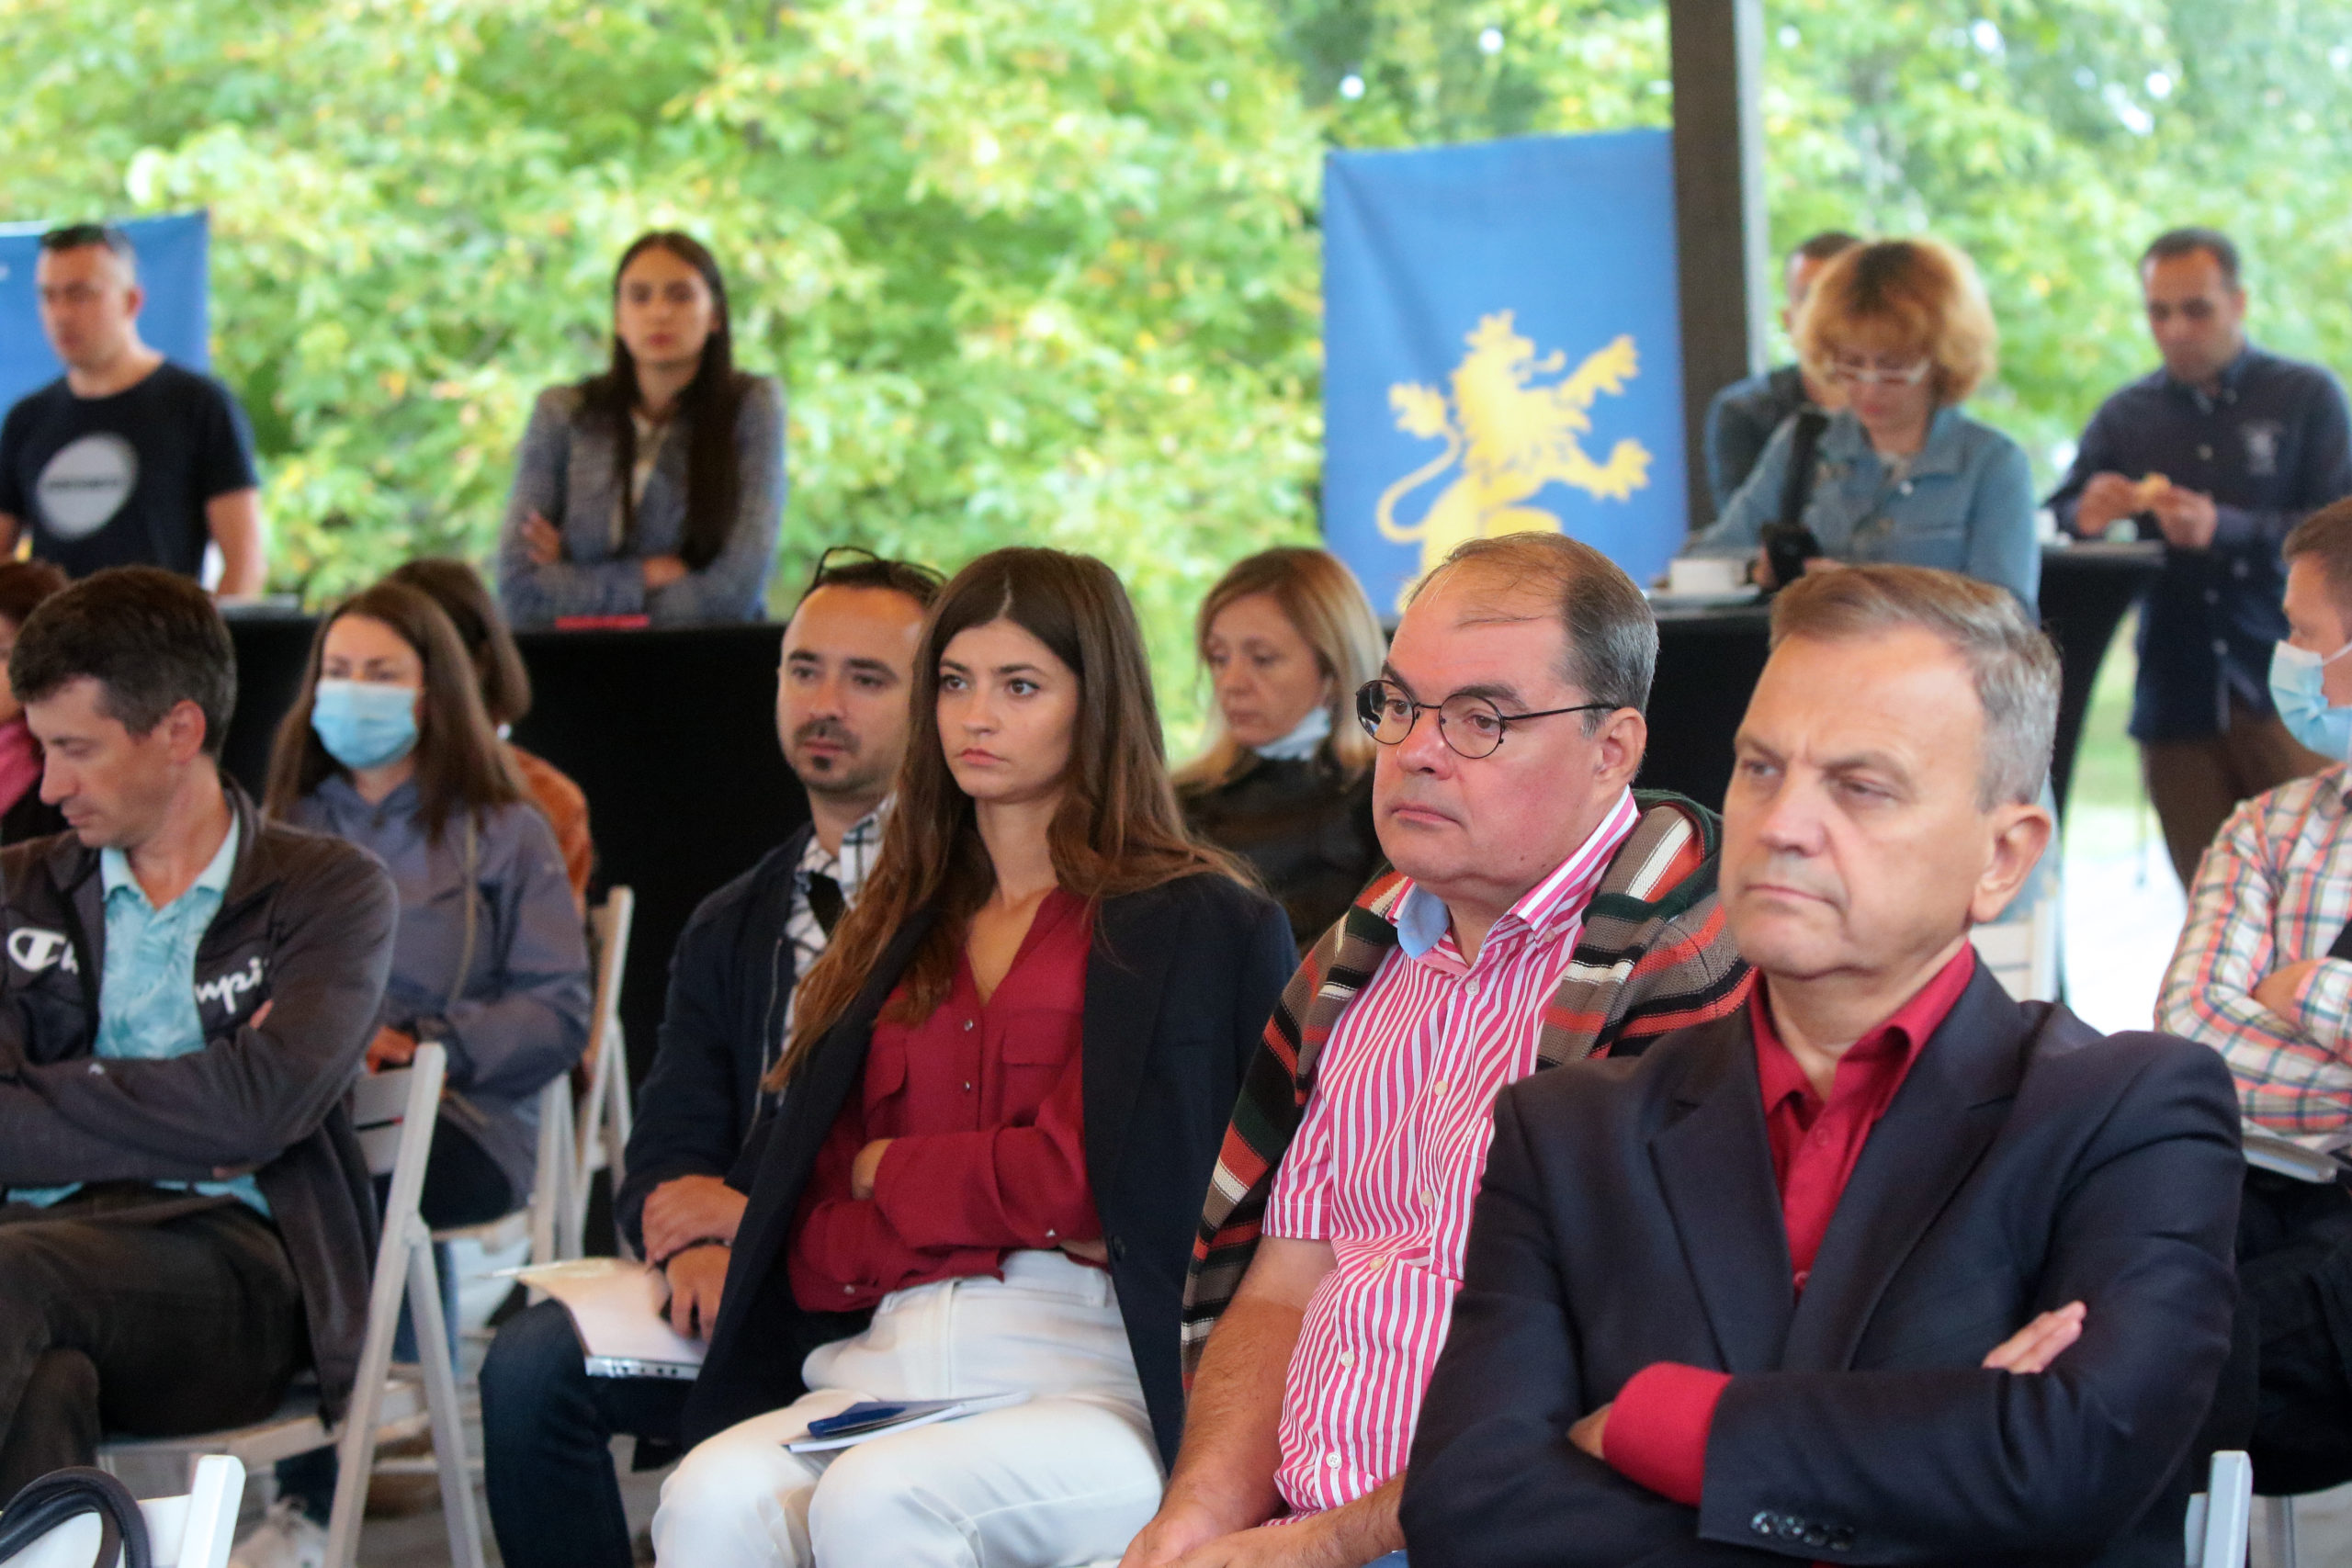 konferentsiia-zlochynni-klany-lvova-trembita-lviv-3-serpnia-2020-5